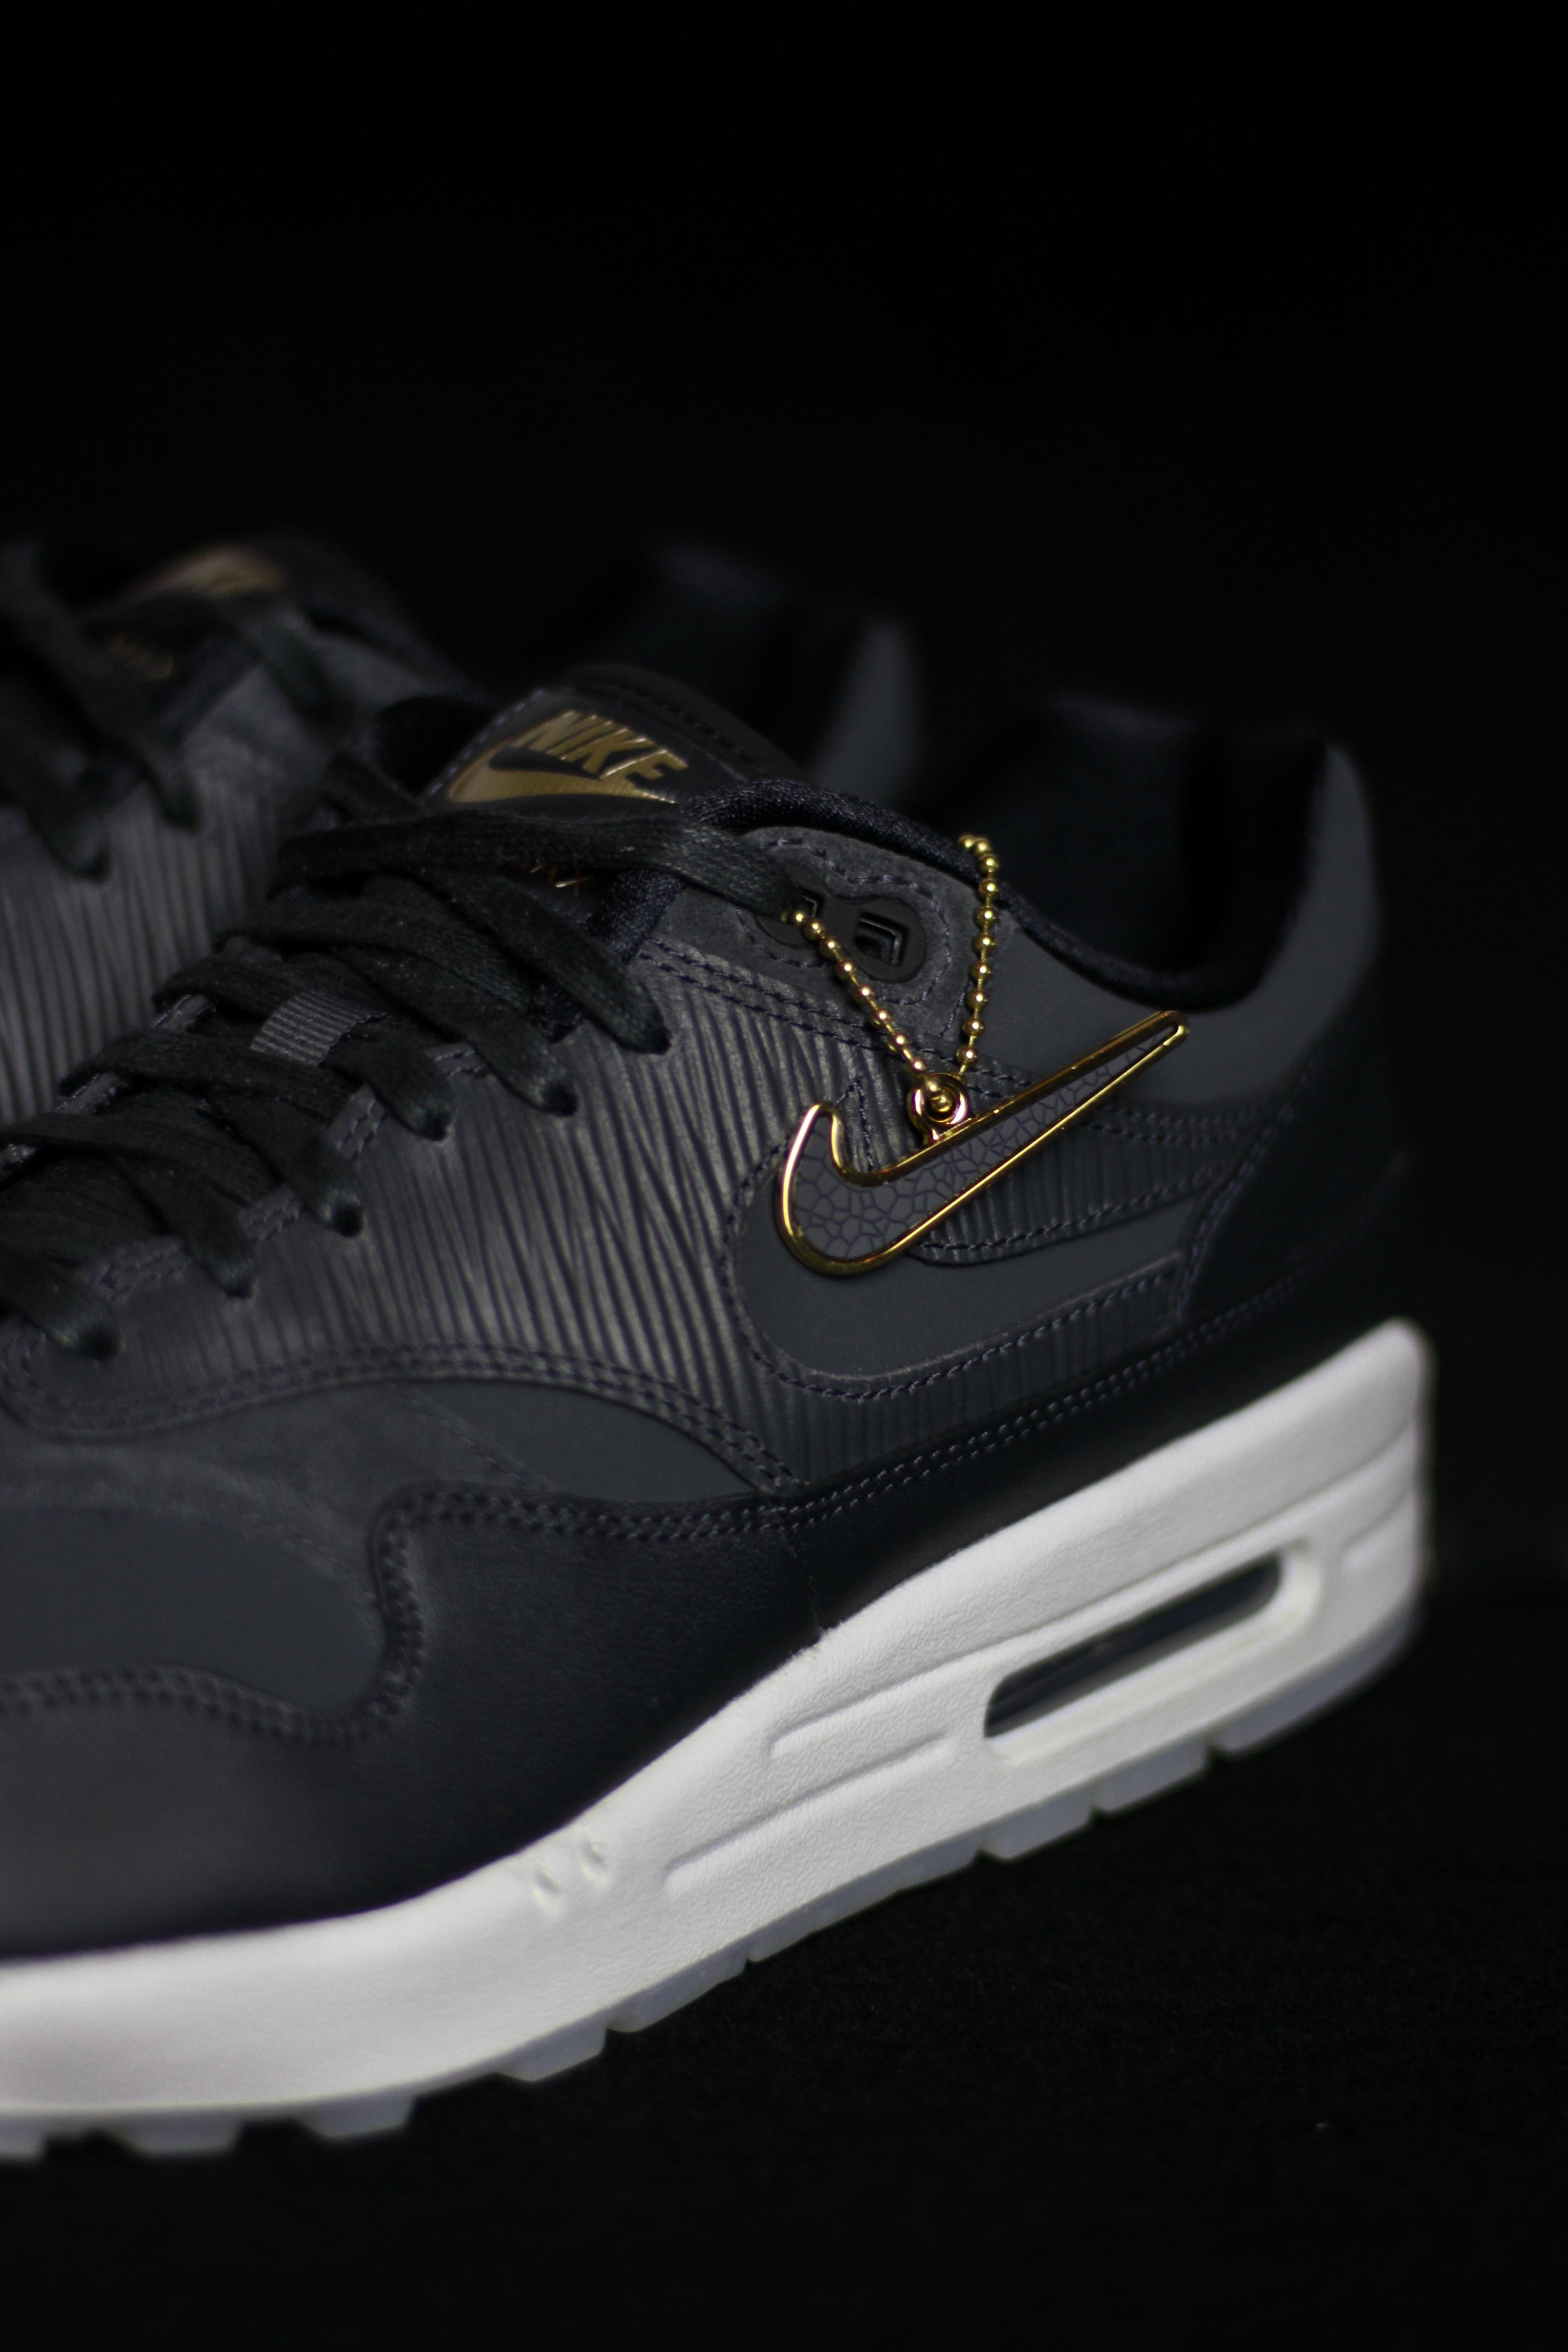 Las zapatillas Nike Air Max 1 Premium para mujer